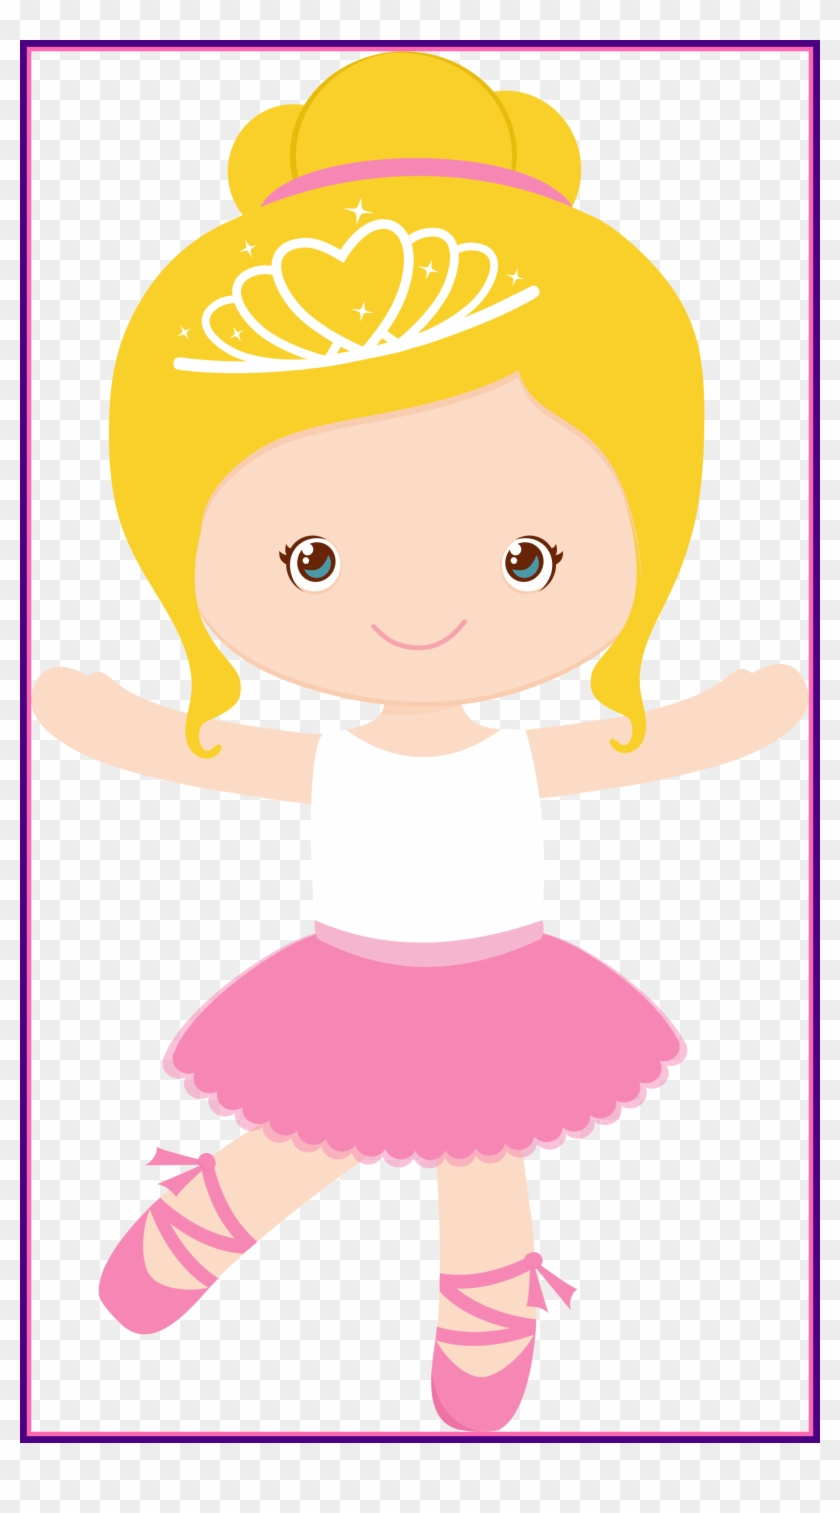 medium resolution of little girl ballerina clipart bailarina png fundo transparente